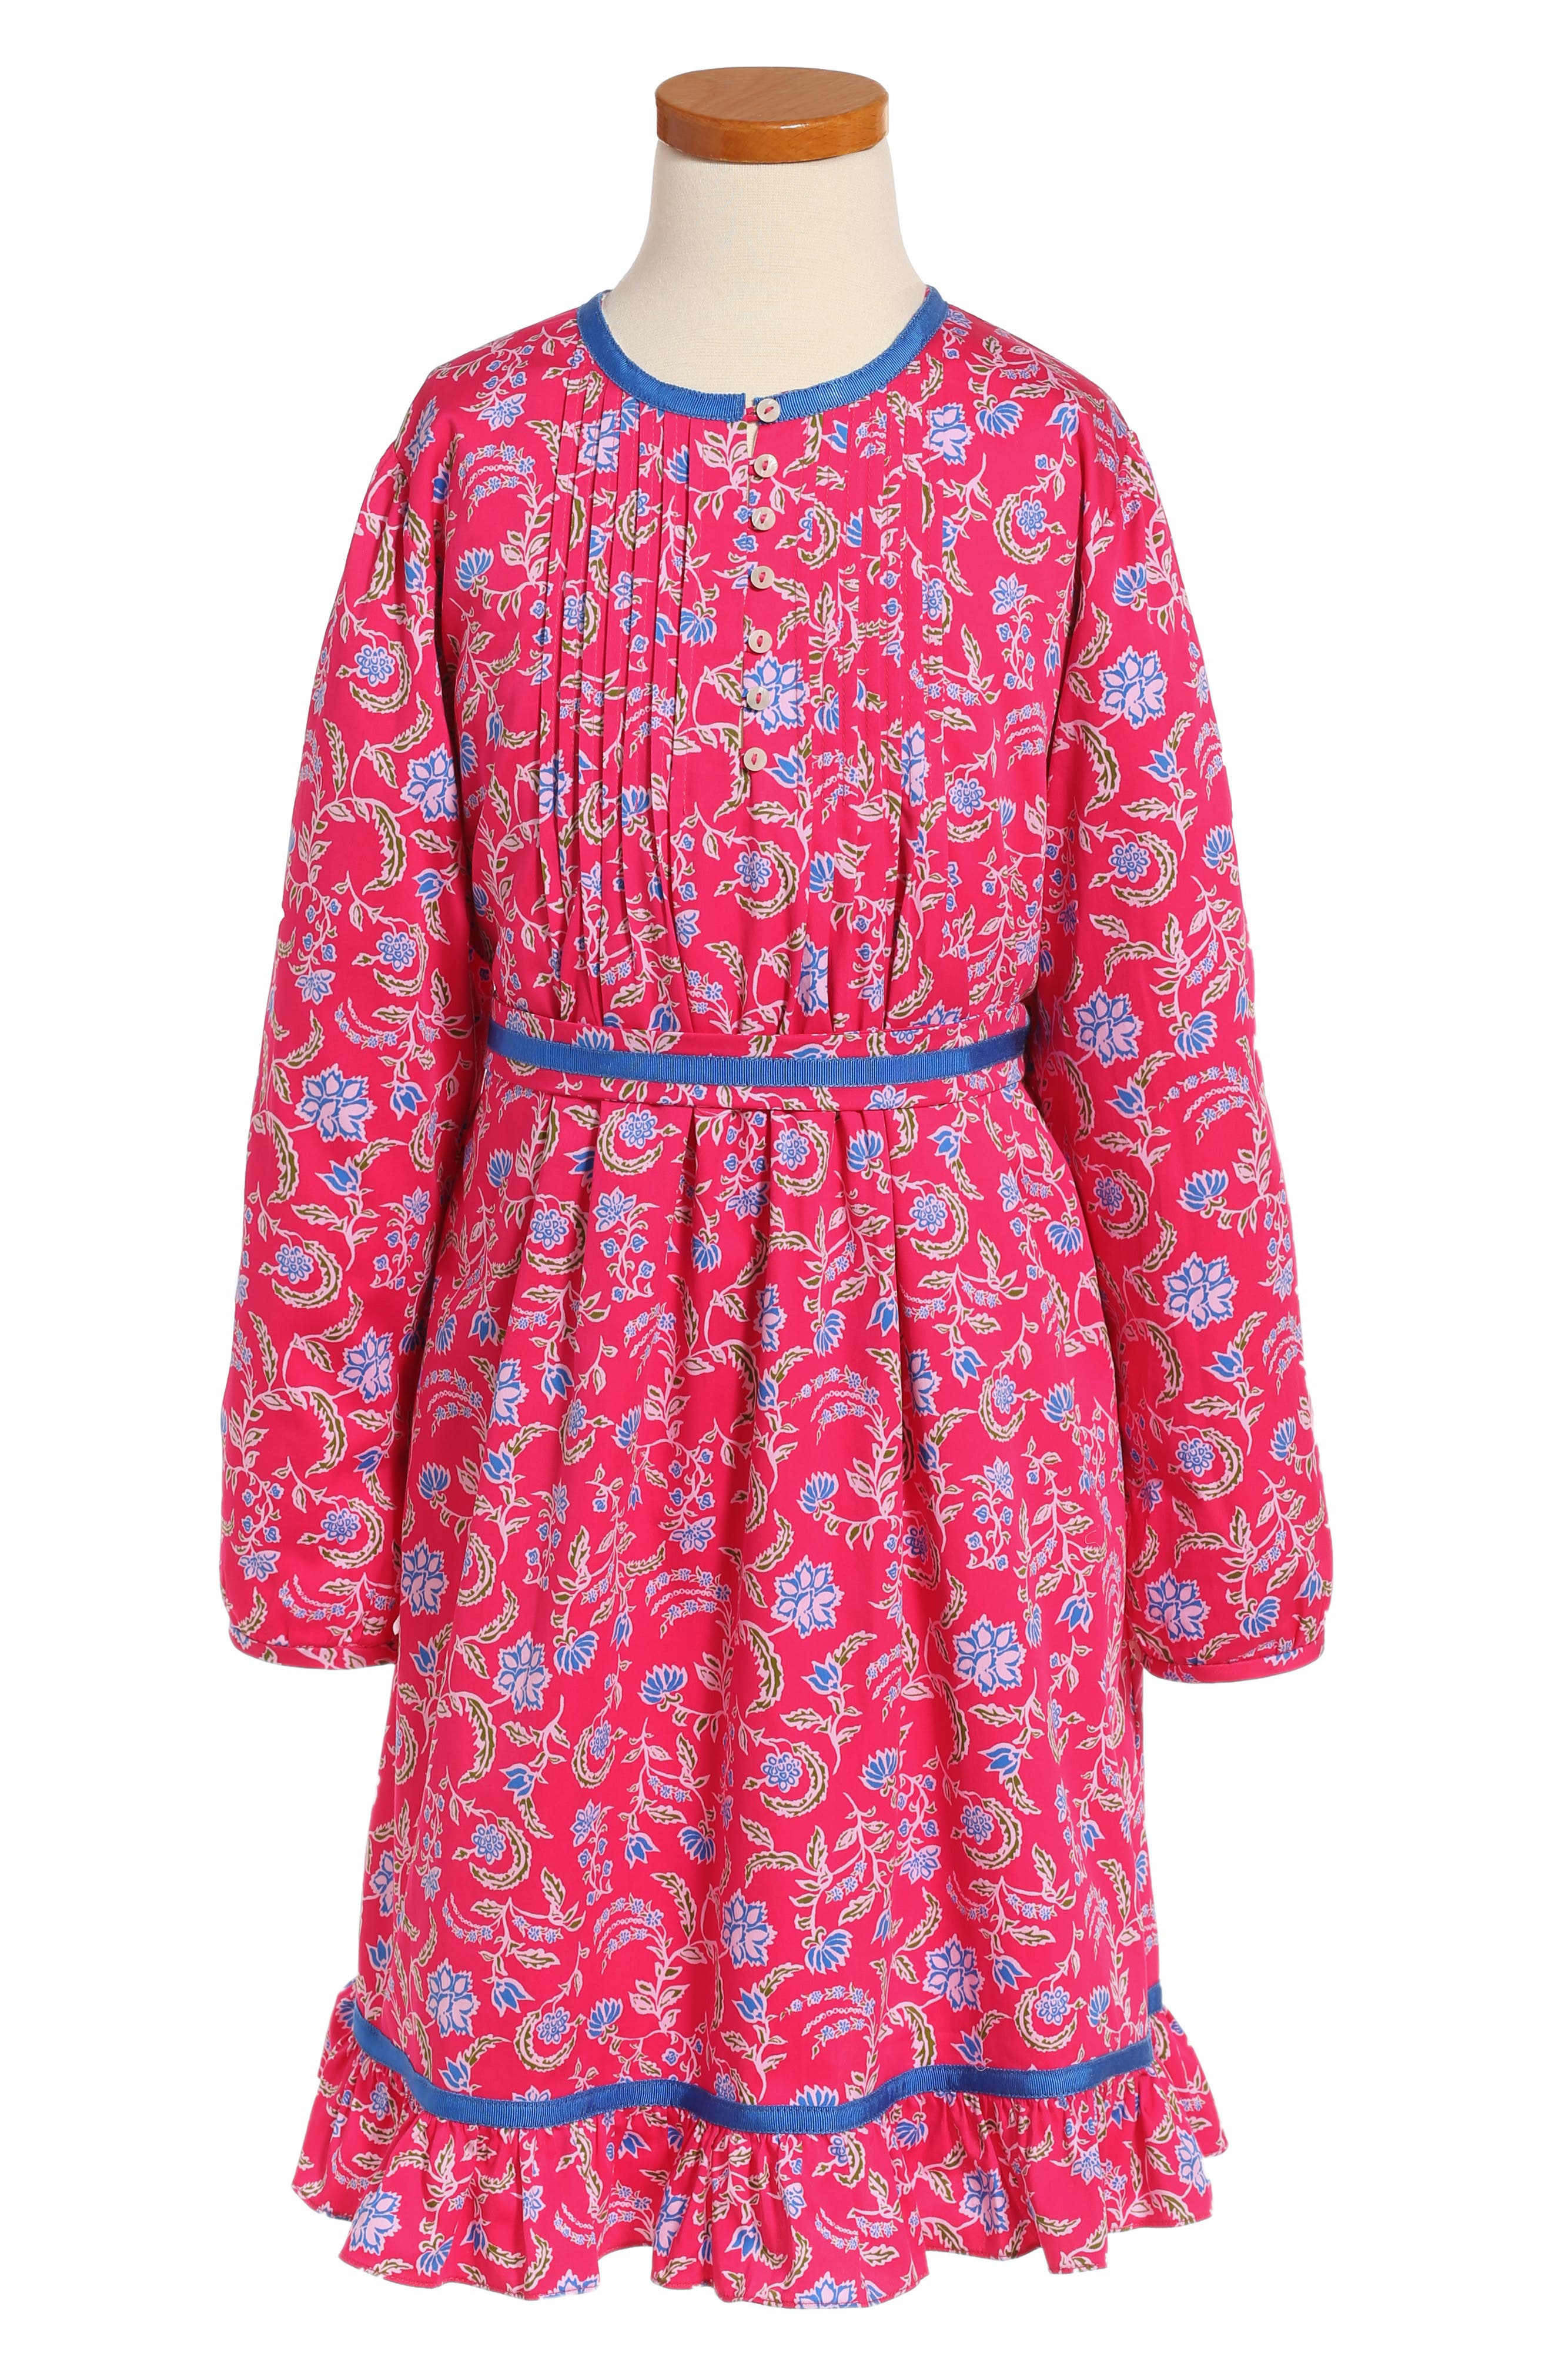 Main Image - Oscar de la Renta Lotus Flower Dress (Big Girls)